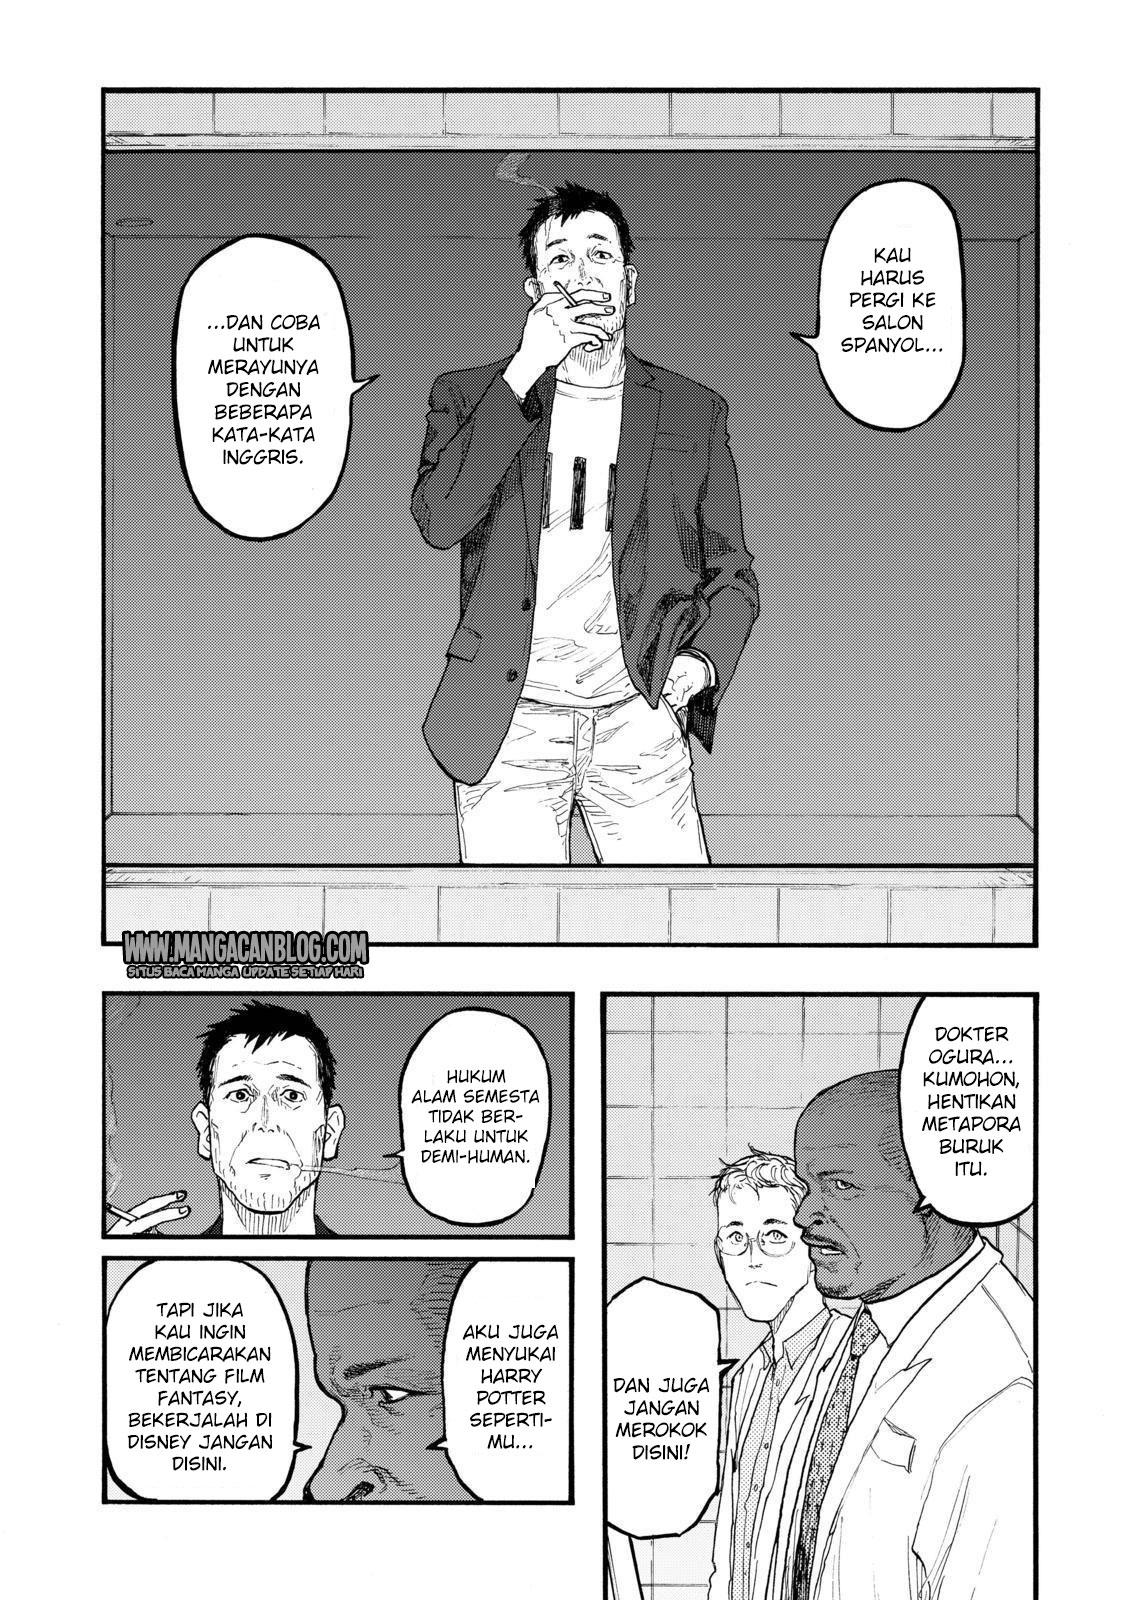 Dilarang COPAS - situs resmi www.mangacanblog.com - Komik ajin 046 - selamat pagi, sampai jumpa besok 47 Indonesia ajin 046 - selamat pagi, sampai jumpa besok Terbaru 10|Baca Manga Komik Indonesia|Mangacan